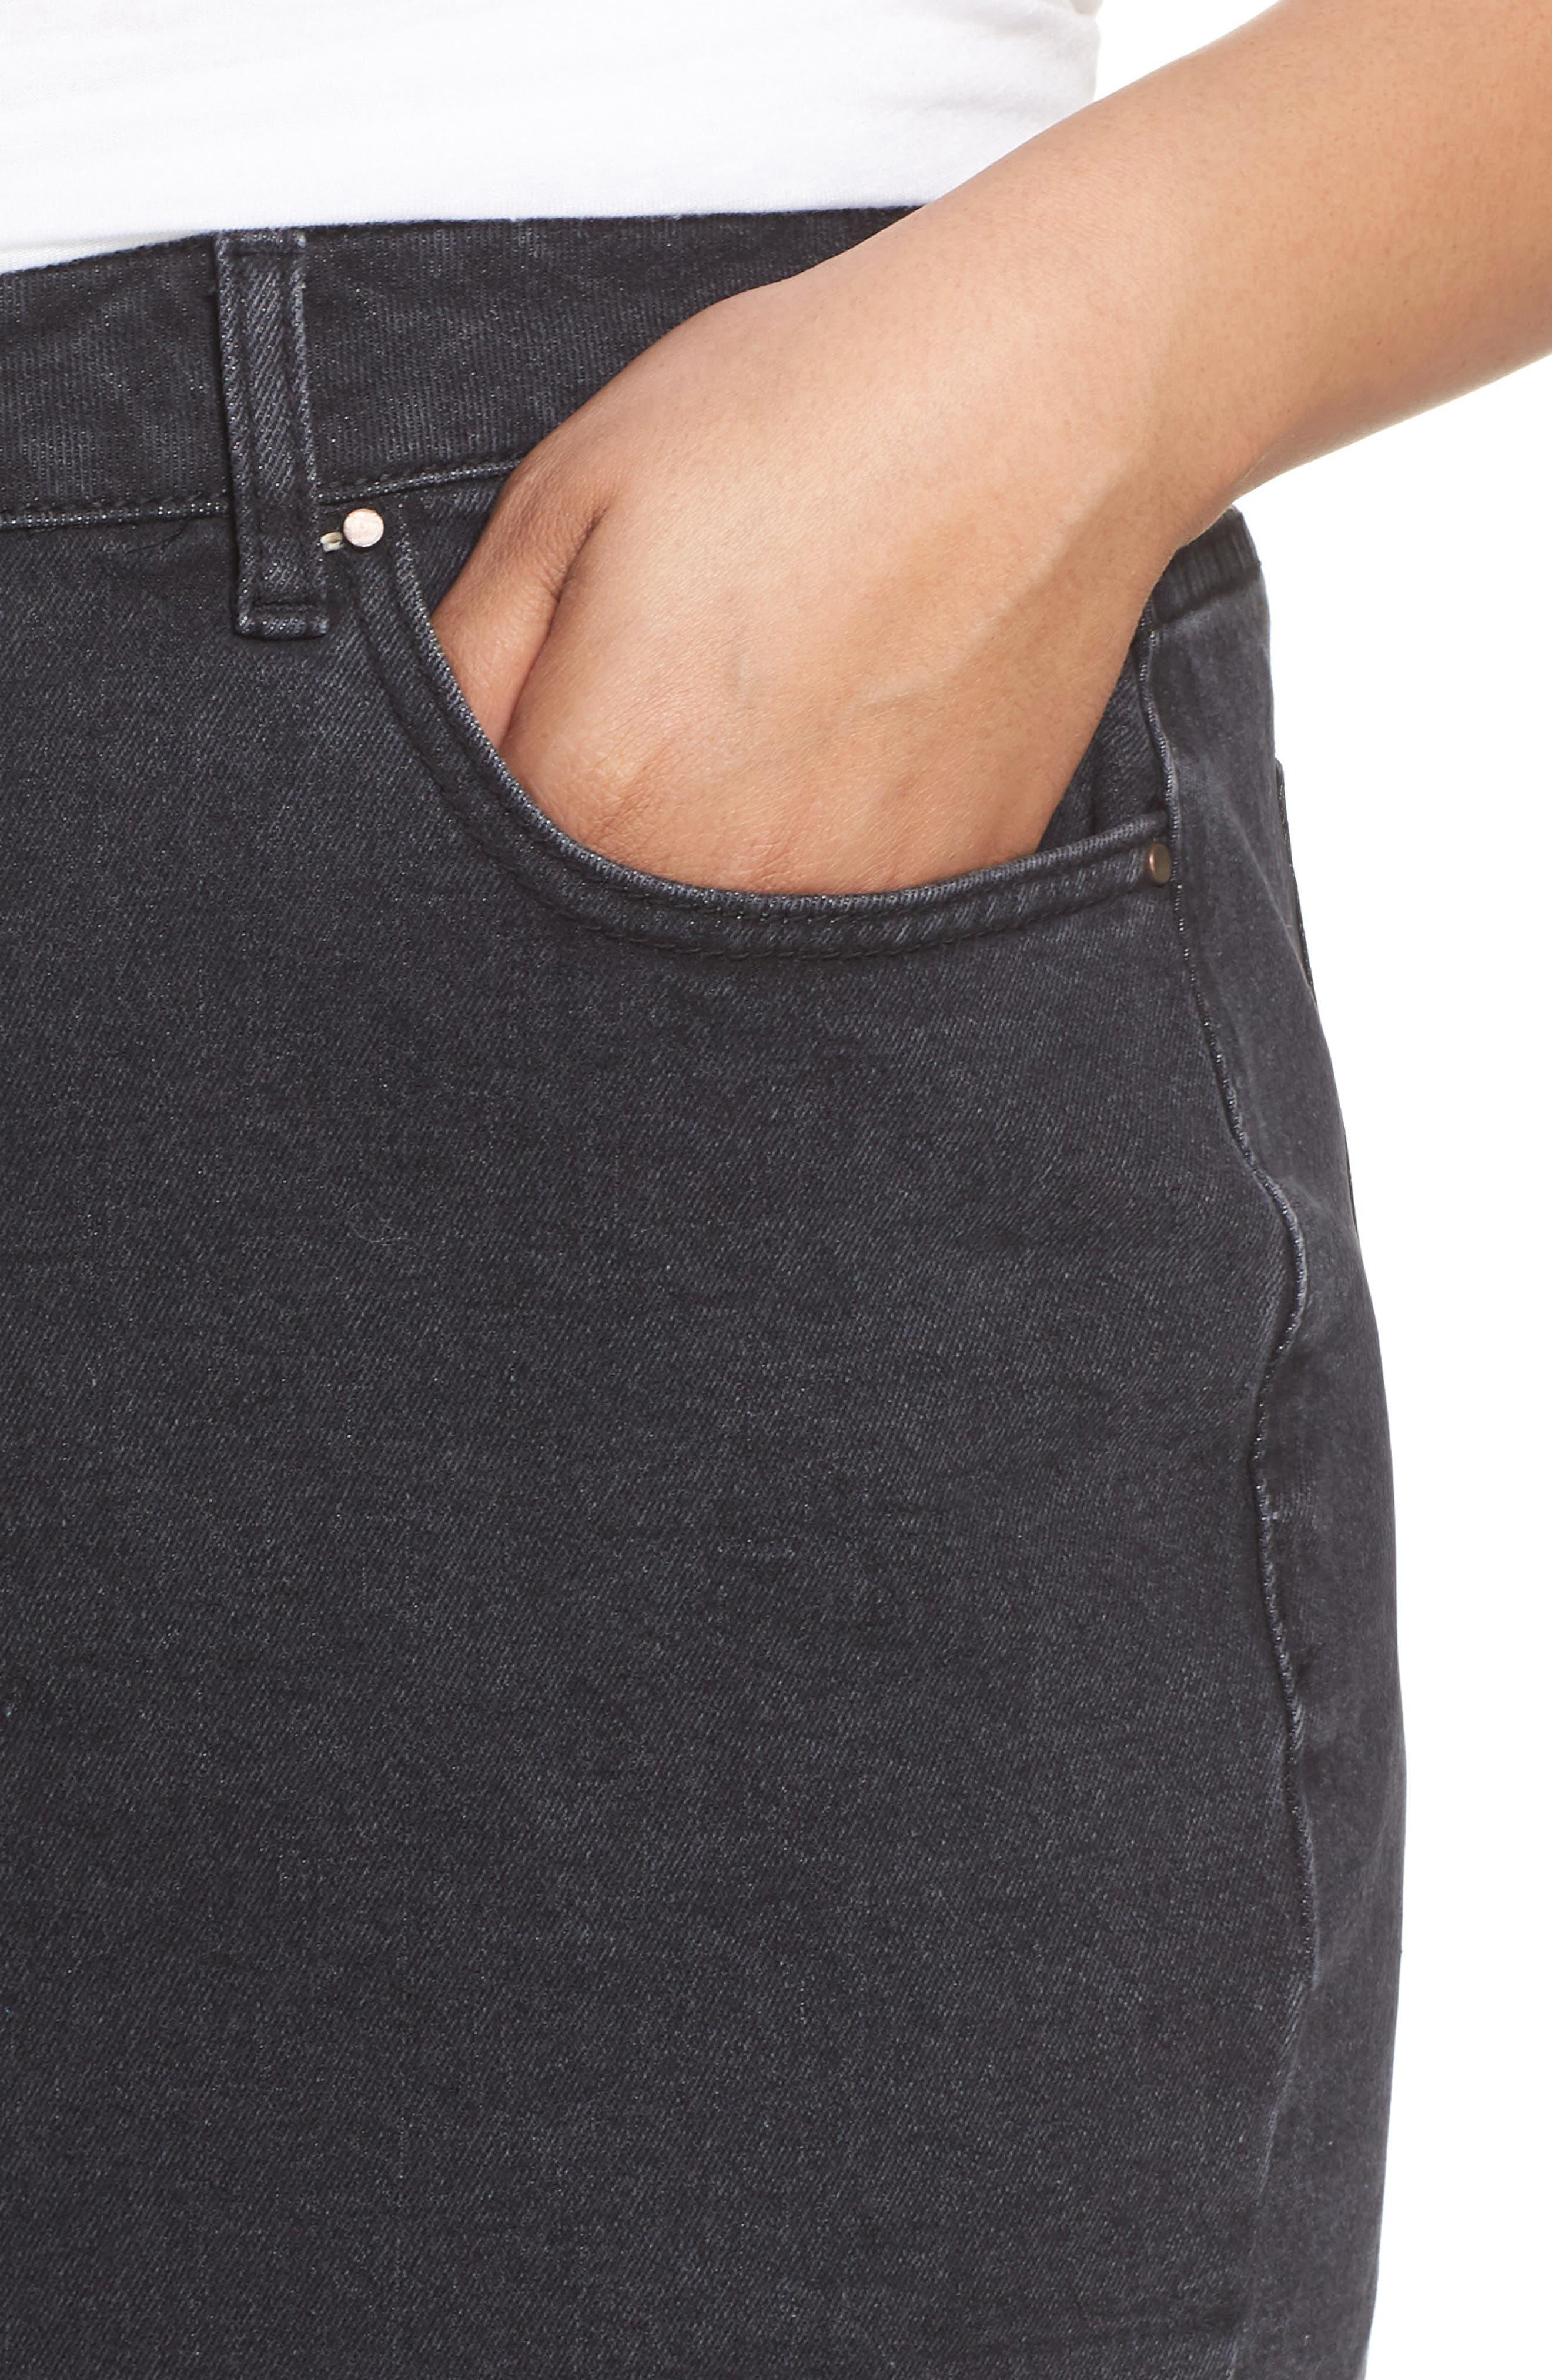 Denim Pencil Skirt,                             Alternate thumbnail 4, color,                             001